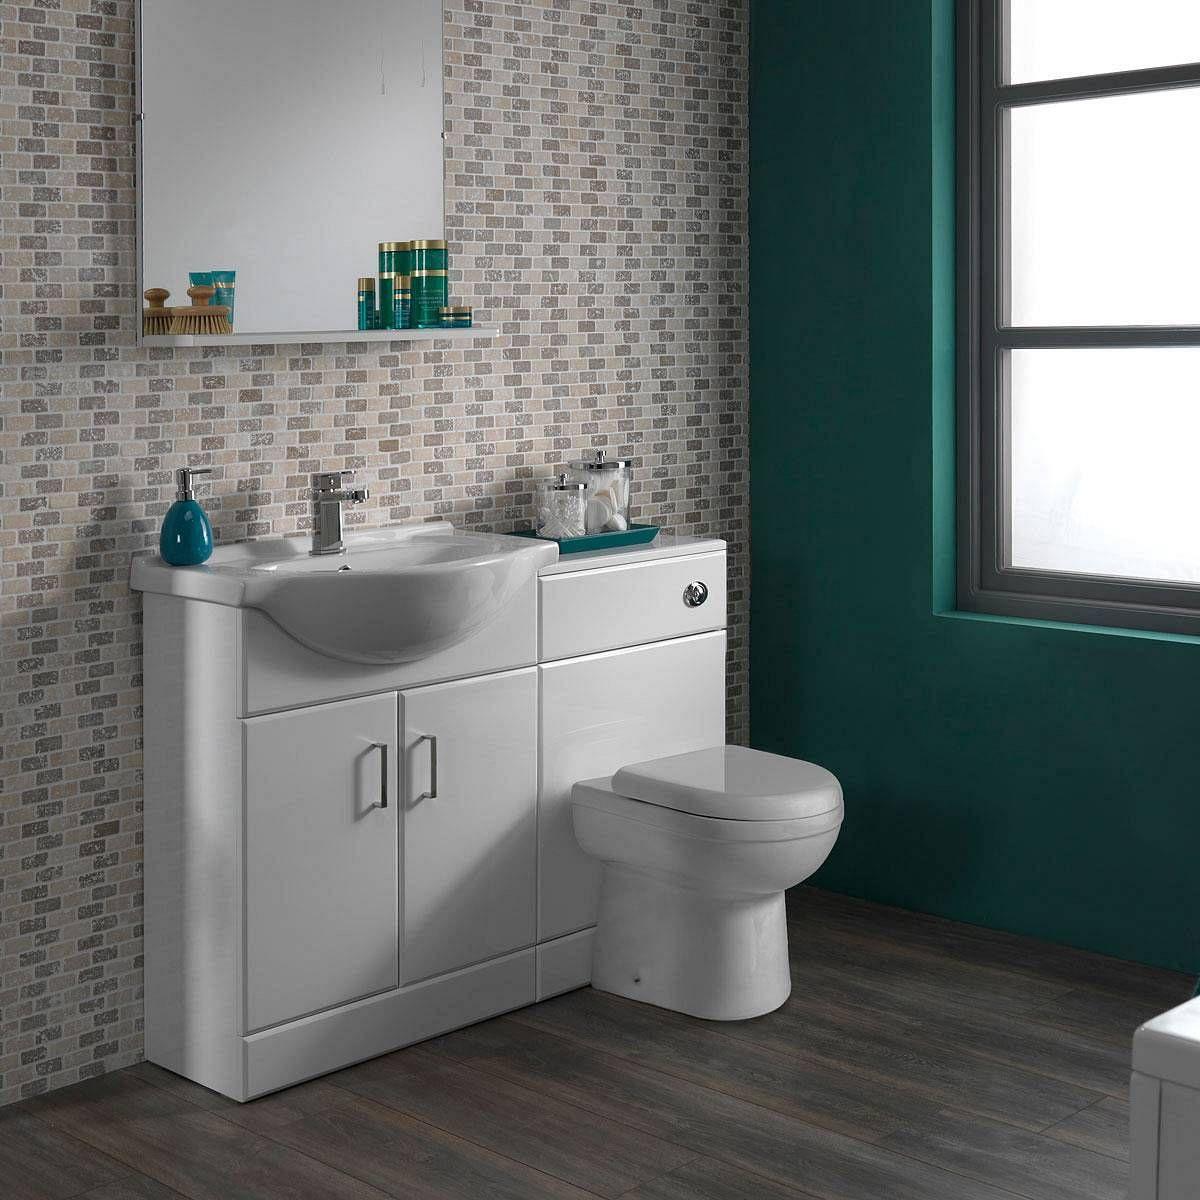 sienna autograph white gloss combination vanity unit small victoria plumb - Bathroom Accessories Victoria Plumb